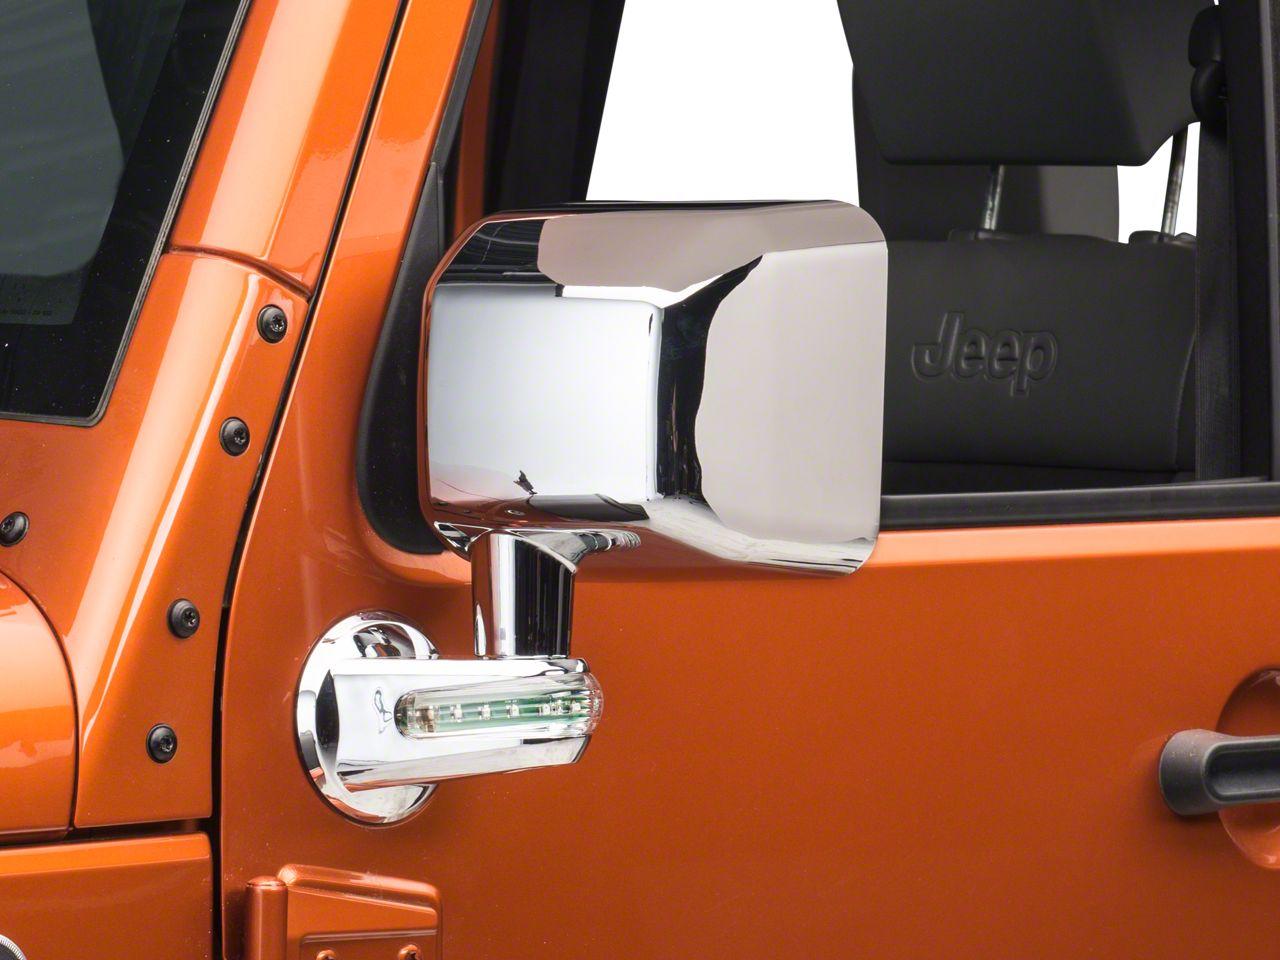 Rugged Ridge Chrome Left Side Mirror w/ LED Turn Signal Indicators (07-10 Jeep Wrangler JK)